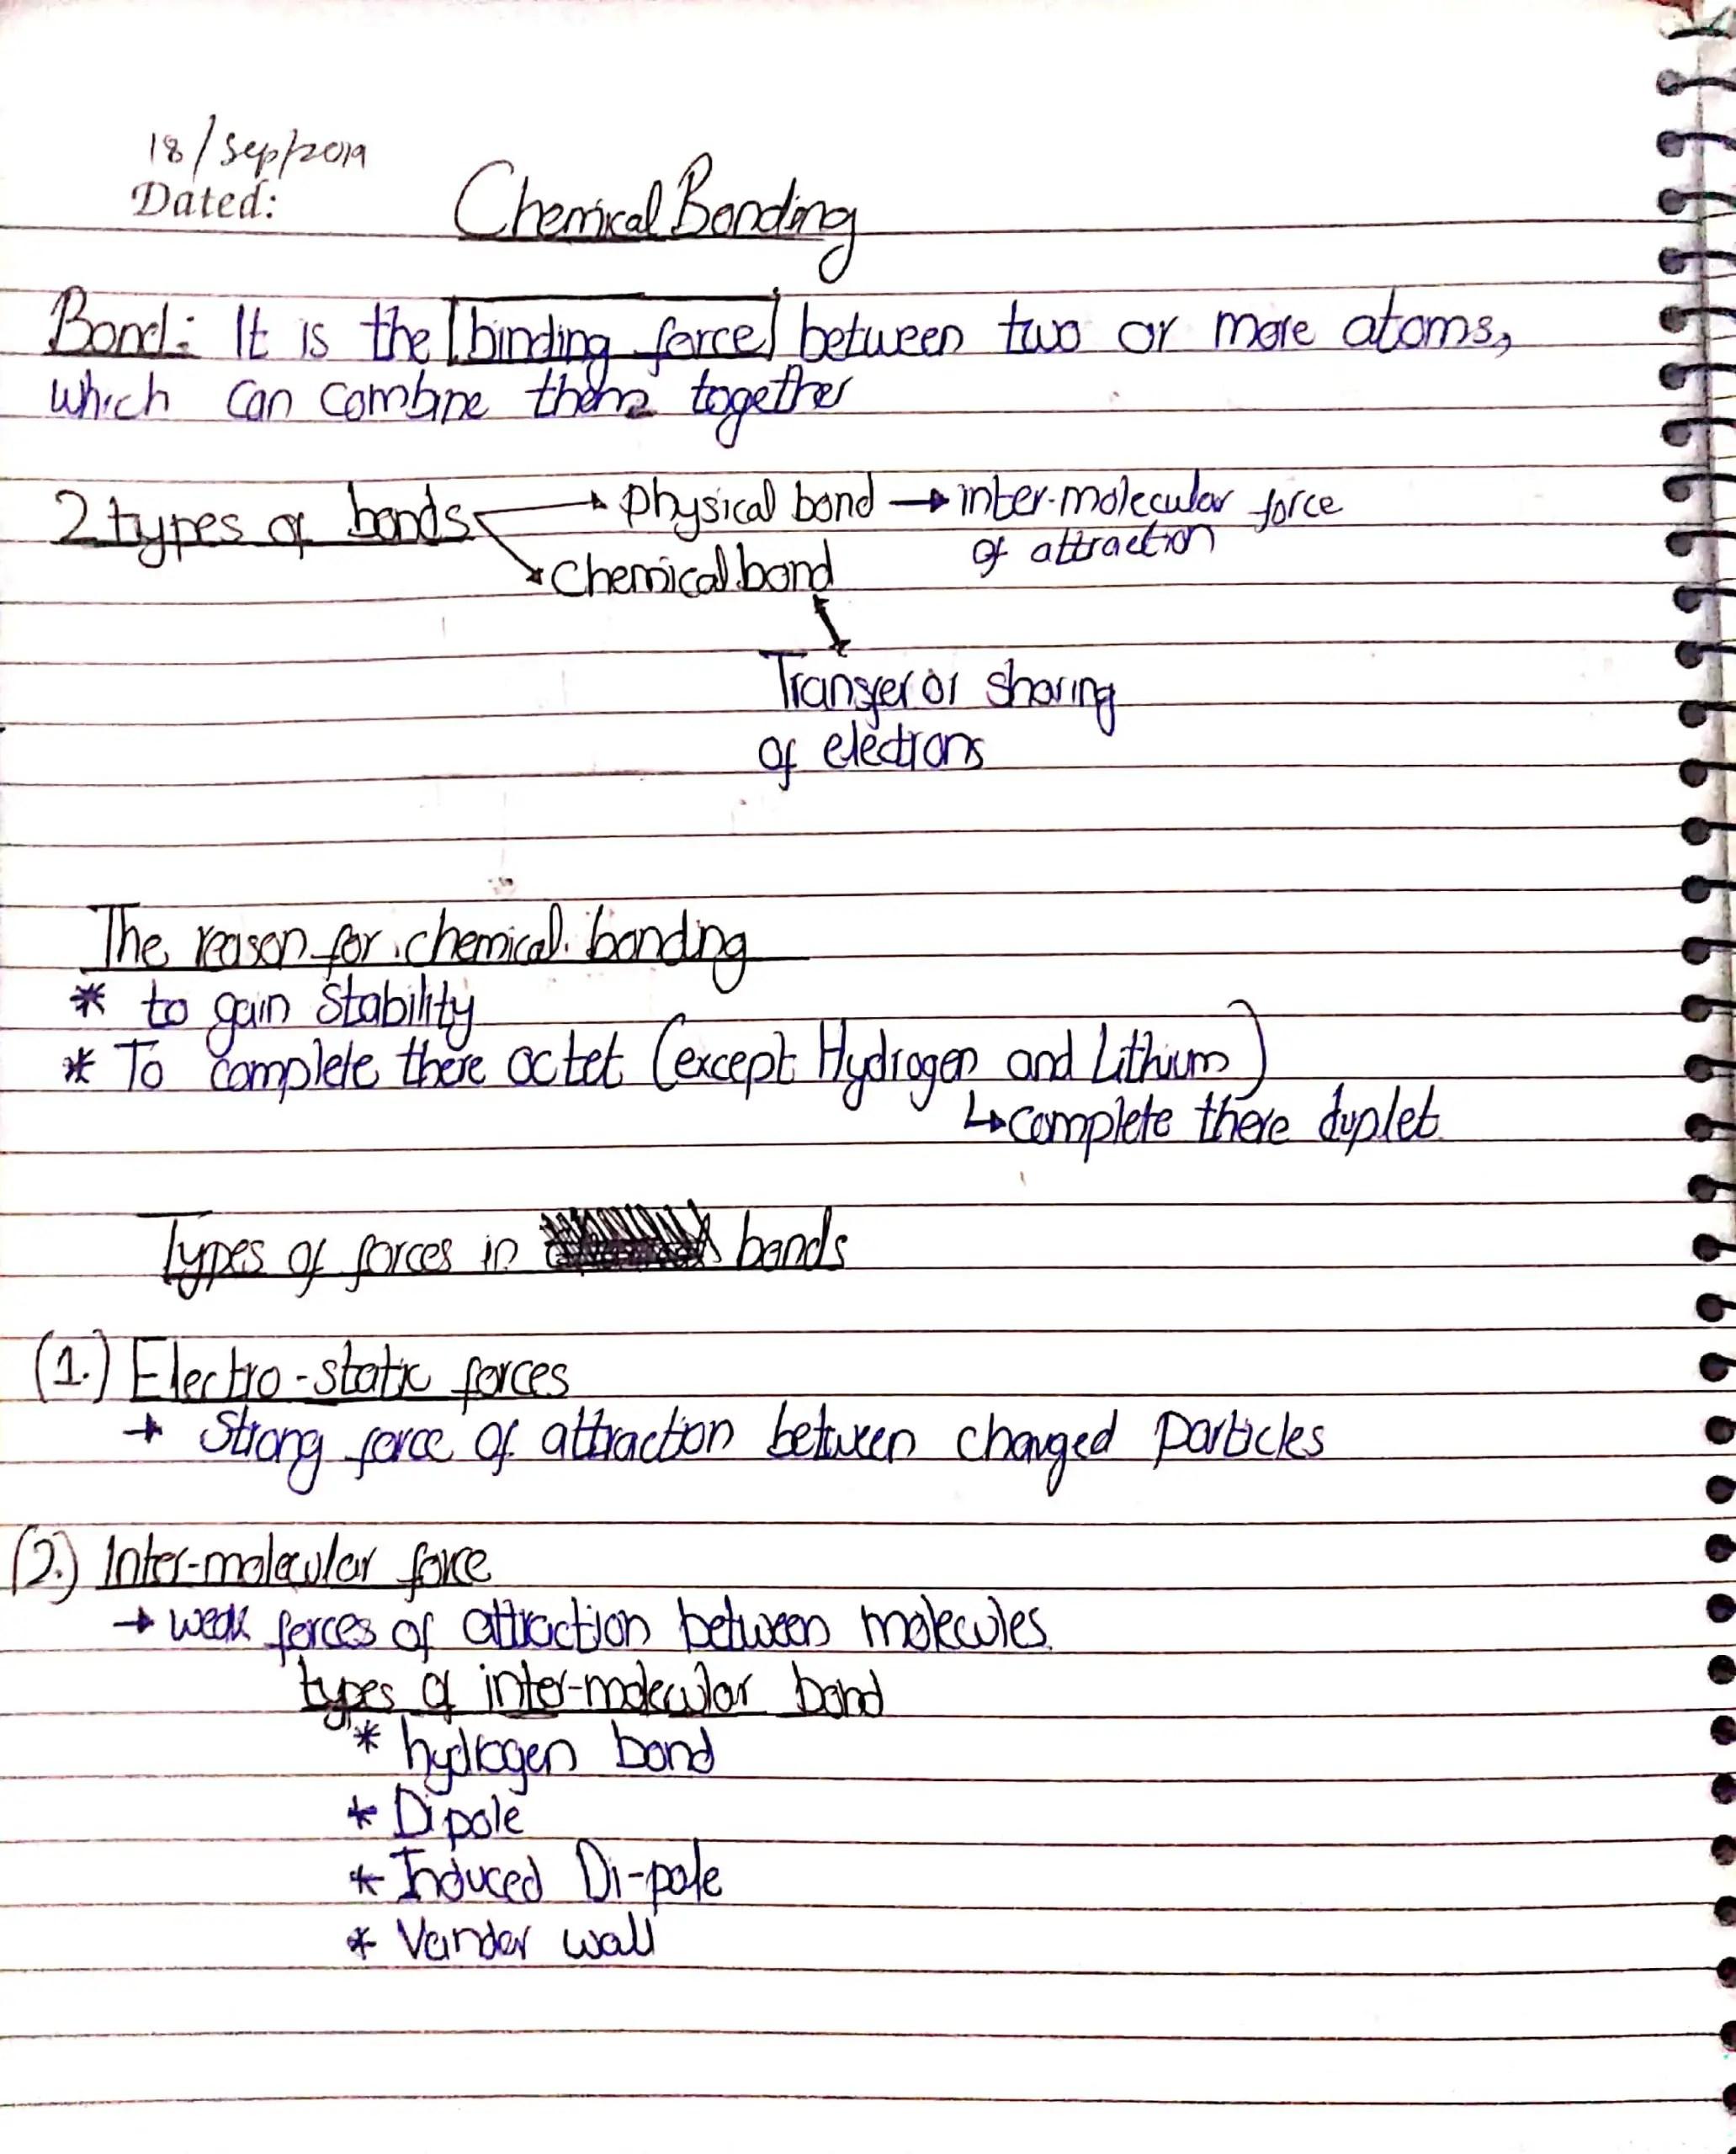 chemical bonding Sir Kashif_1